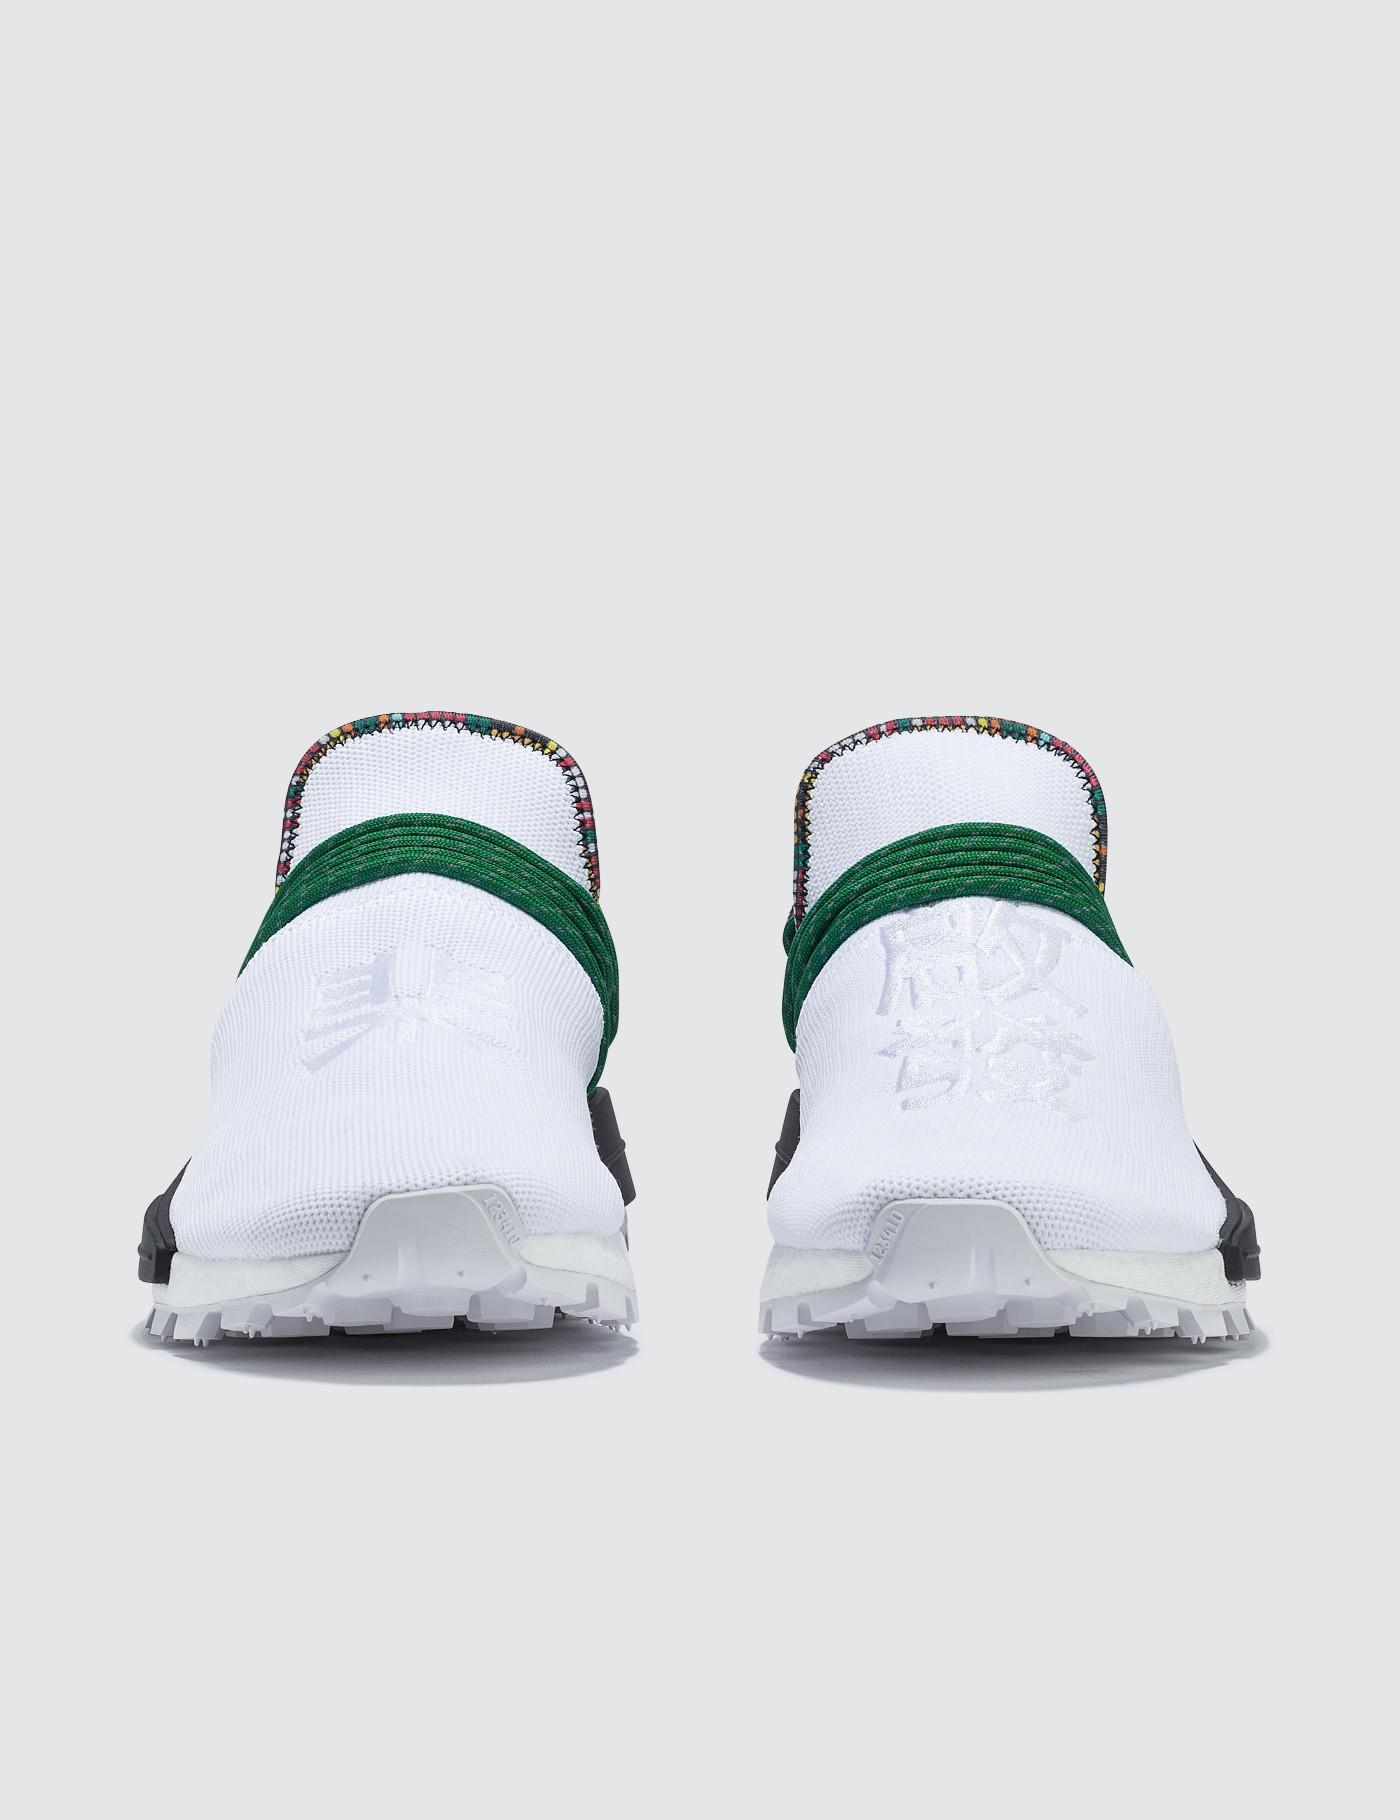 d7d31823496fd Lyst - adidas Originals Pharrell Williams X Adidas Pw Solar Hu Nmd ...